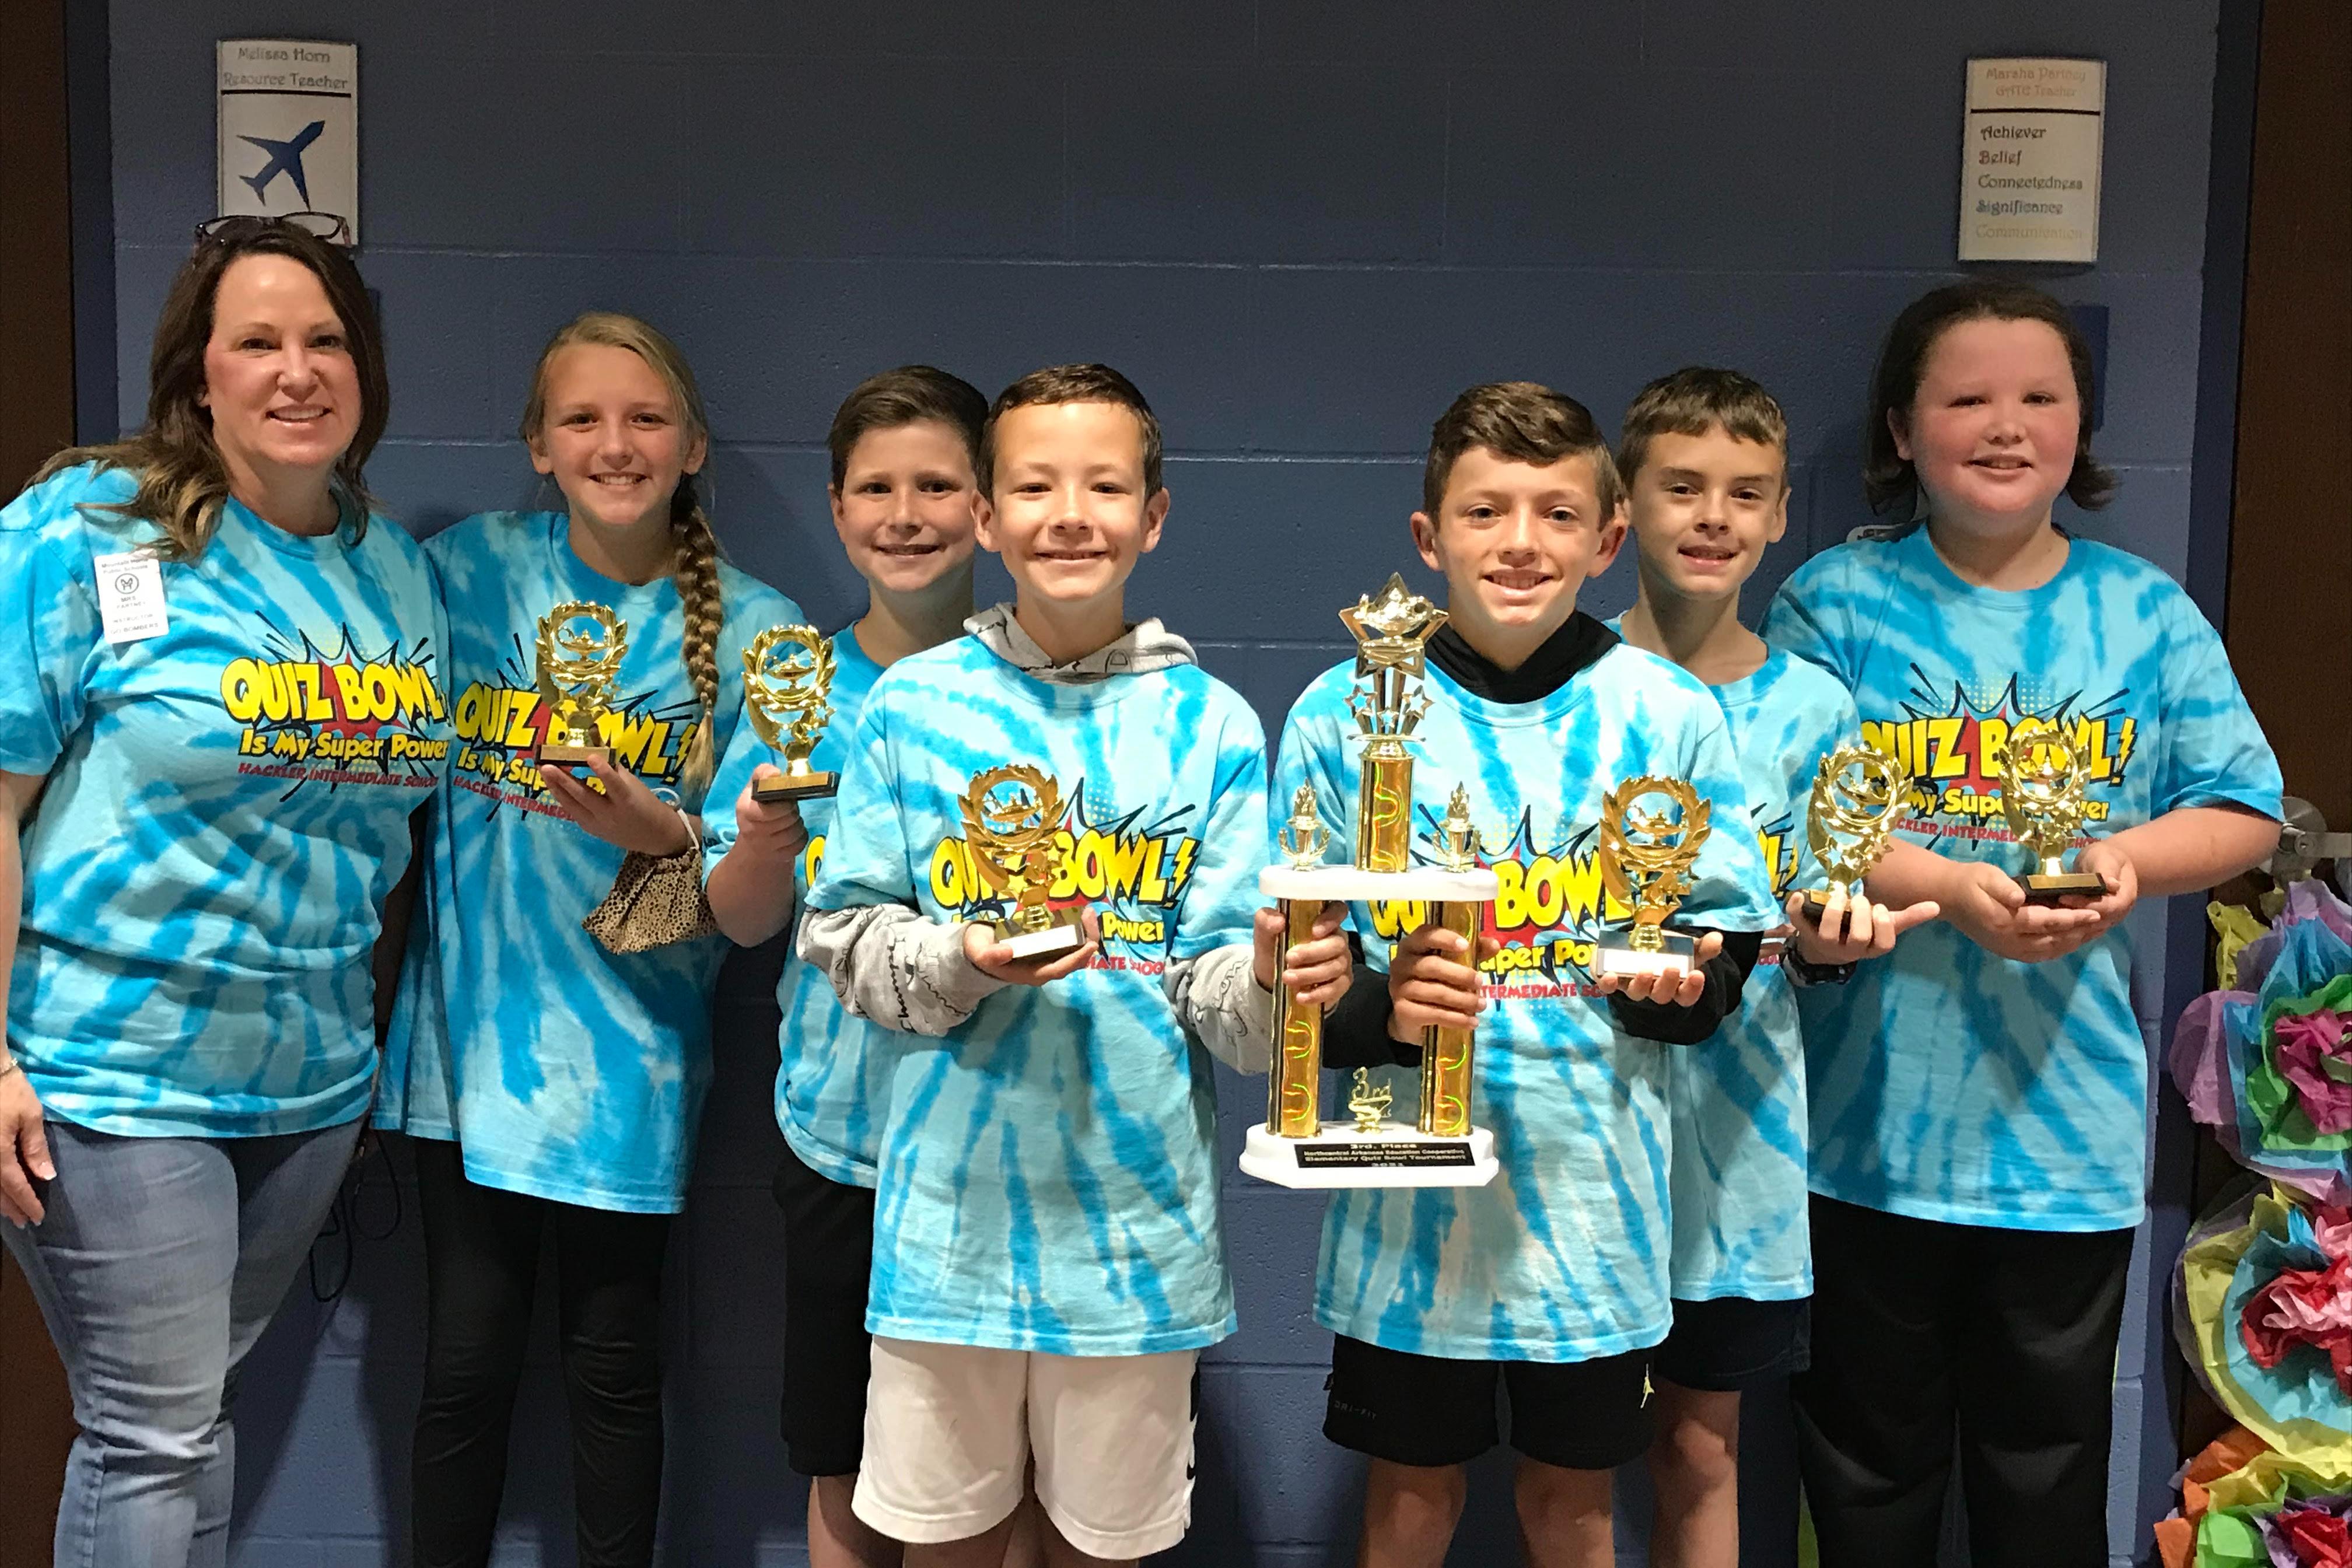 Quiz bowl team from intermediate school holding trophies.